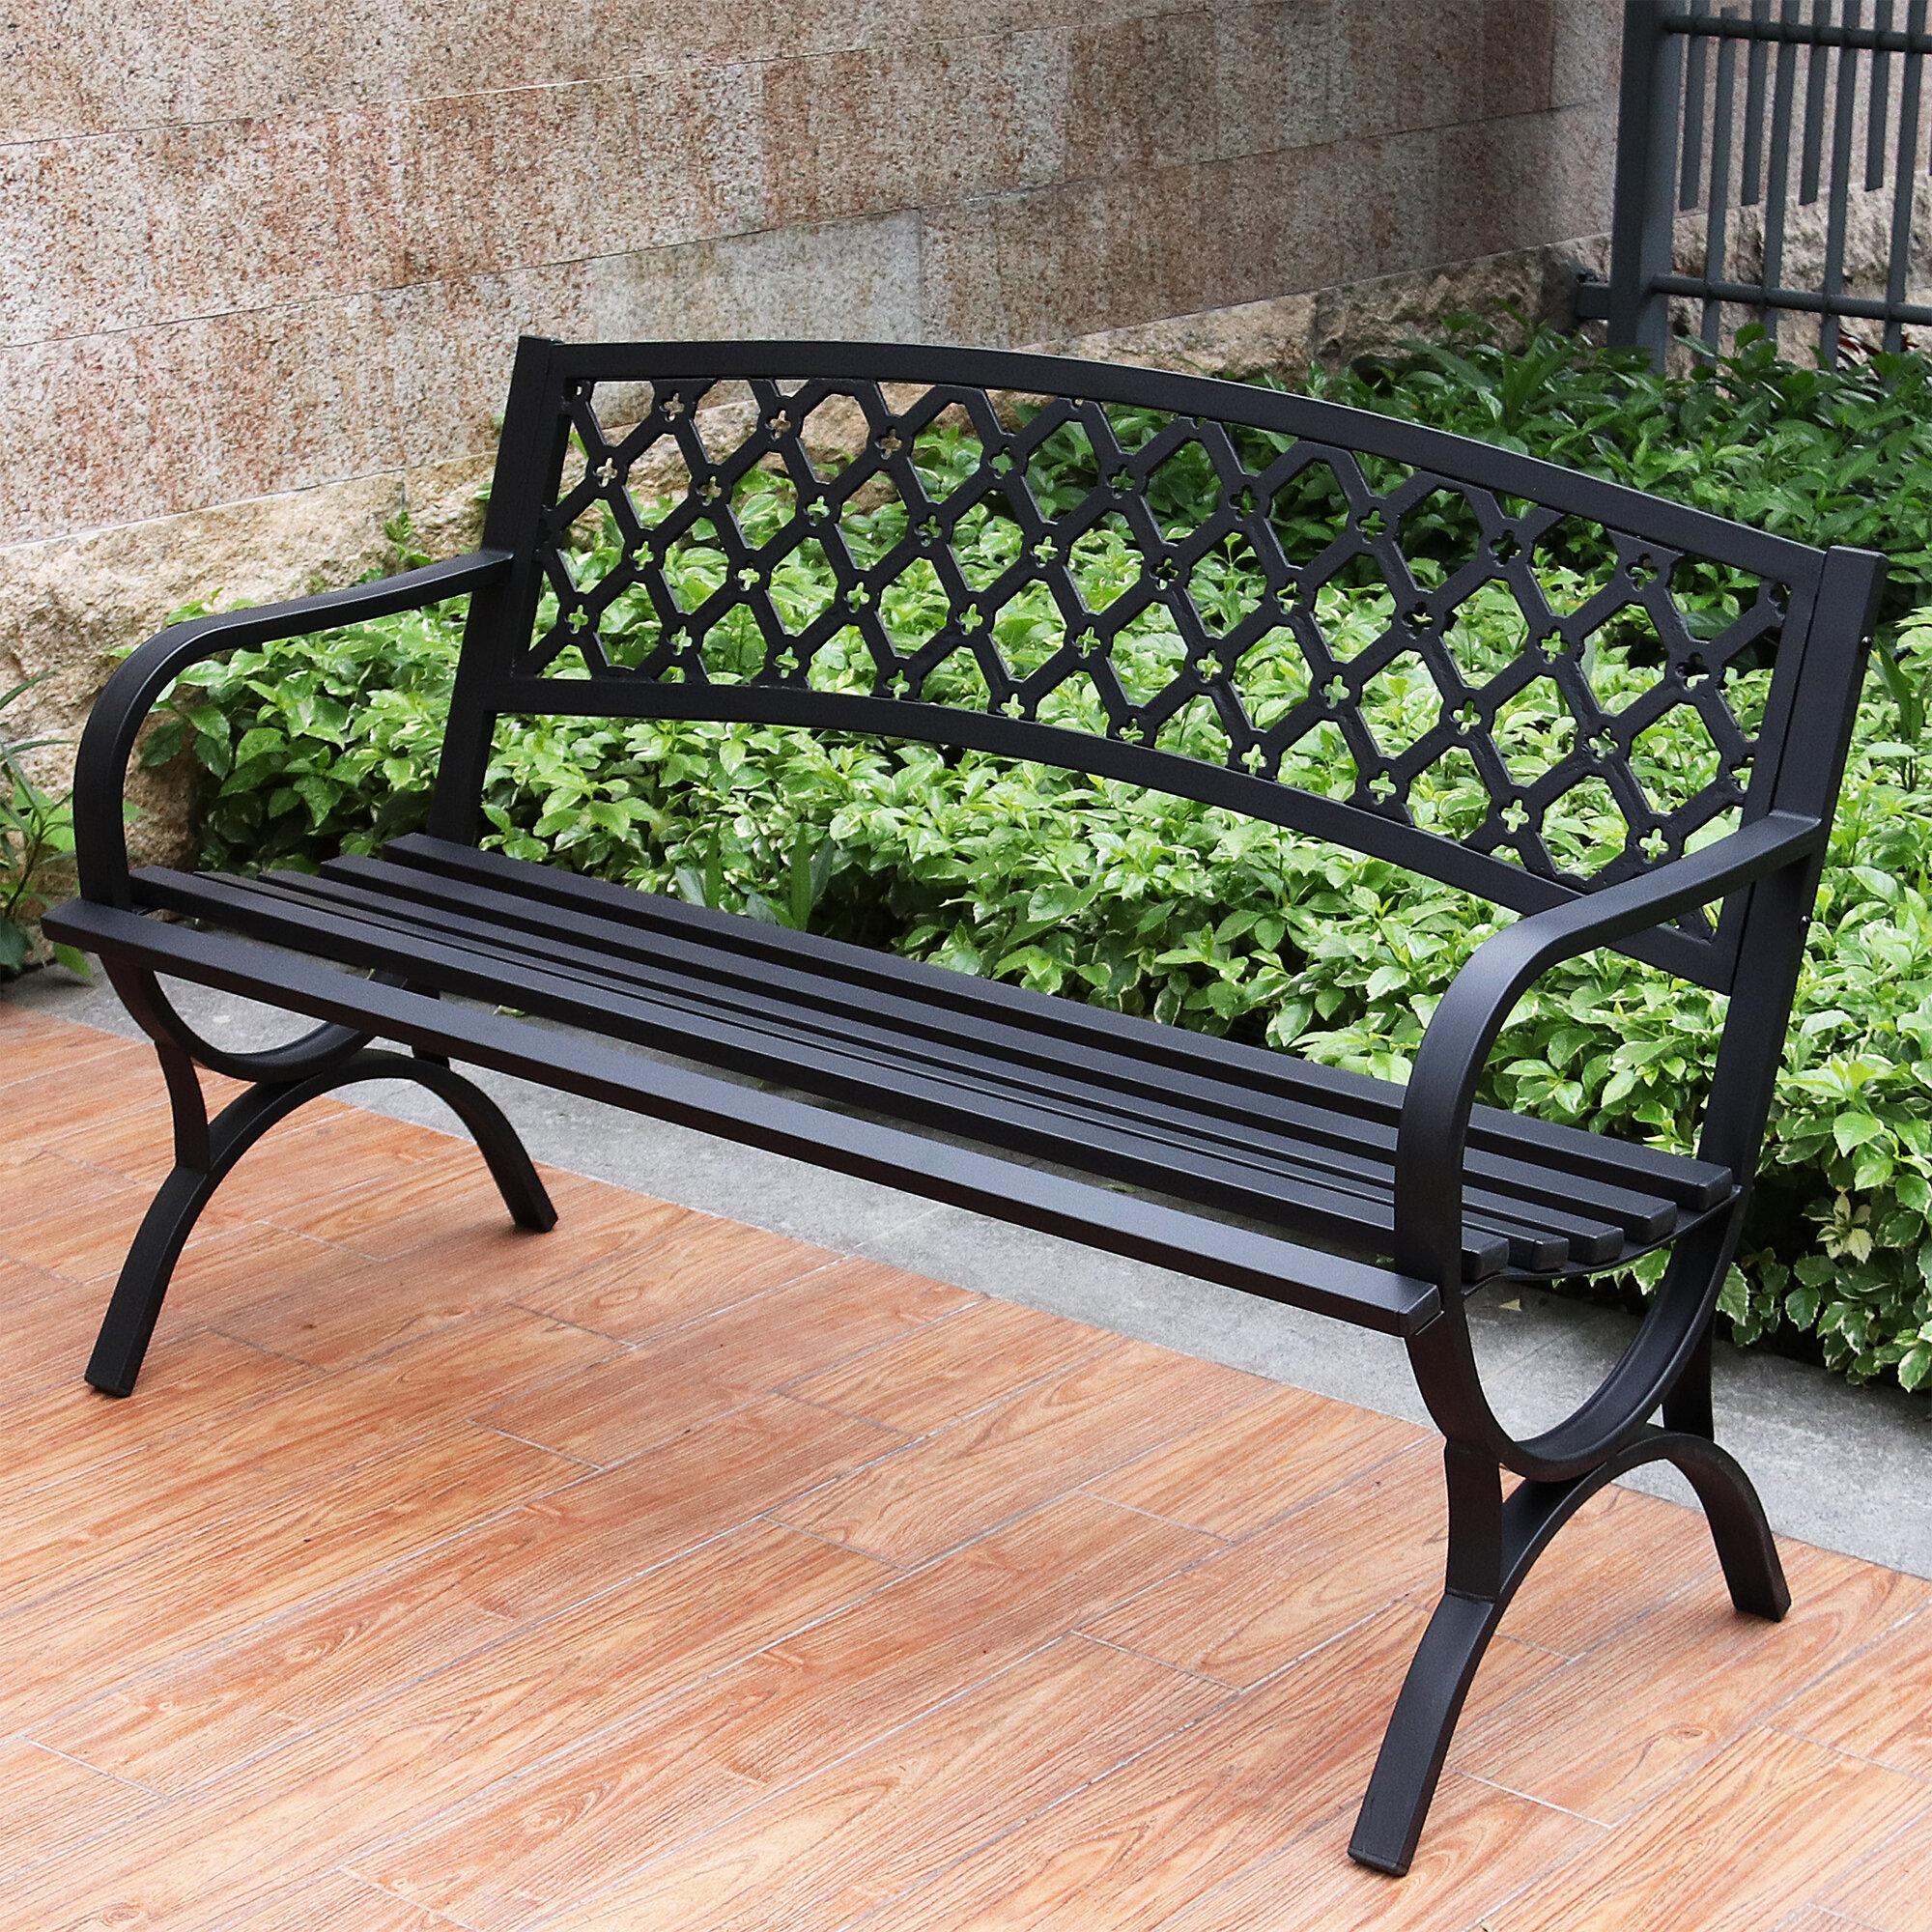 Enjoyable Verwood Steel Garden Bench Machost Co Dining Chair Design Ideas Machostcouk